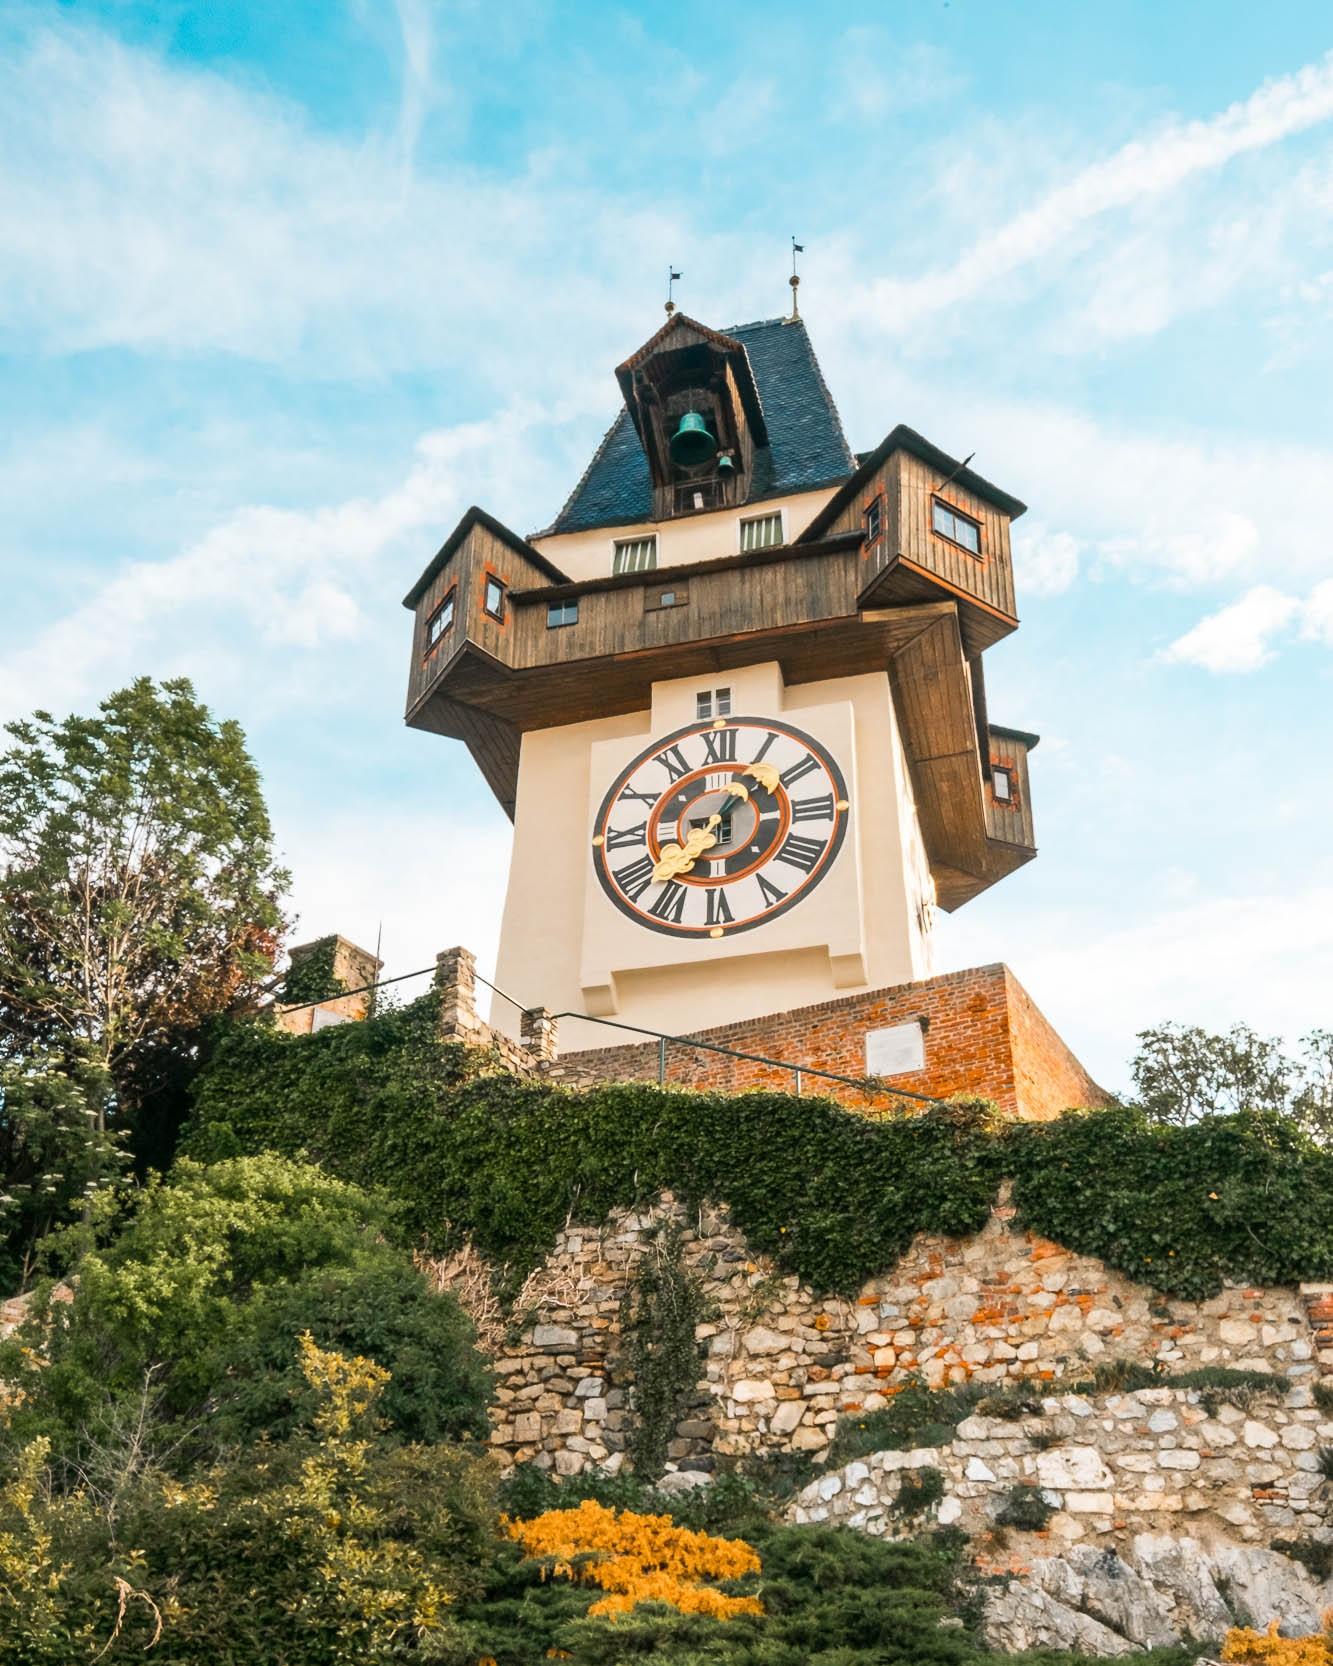 Things+to+do+in+Graz+Graz+Clock+Tower.jpg